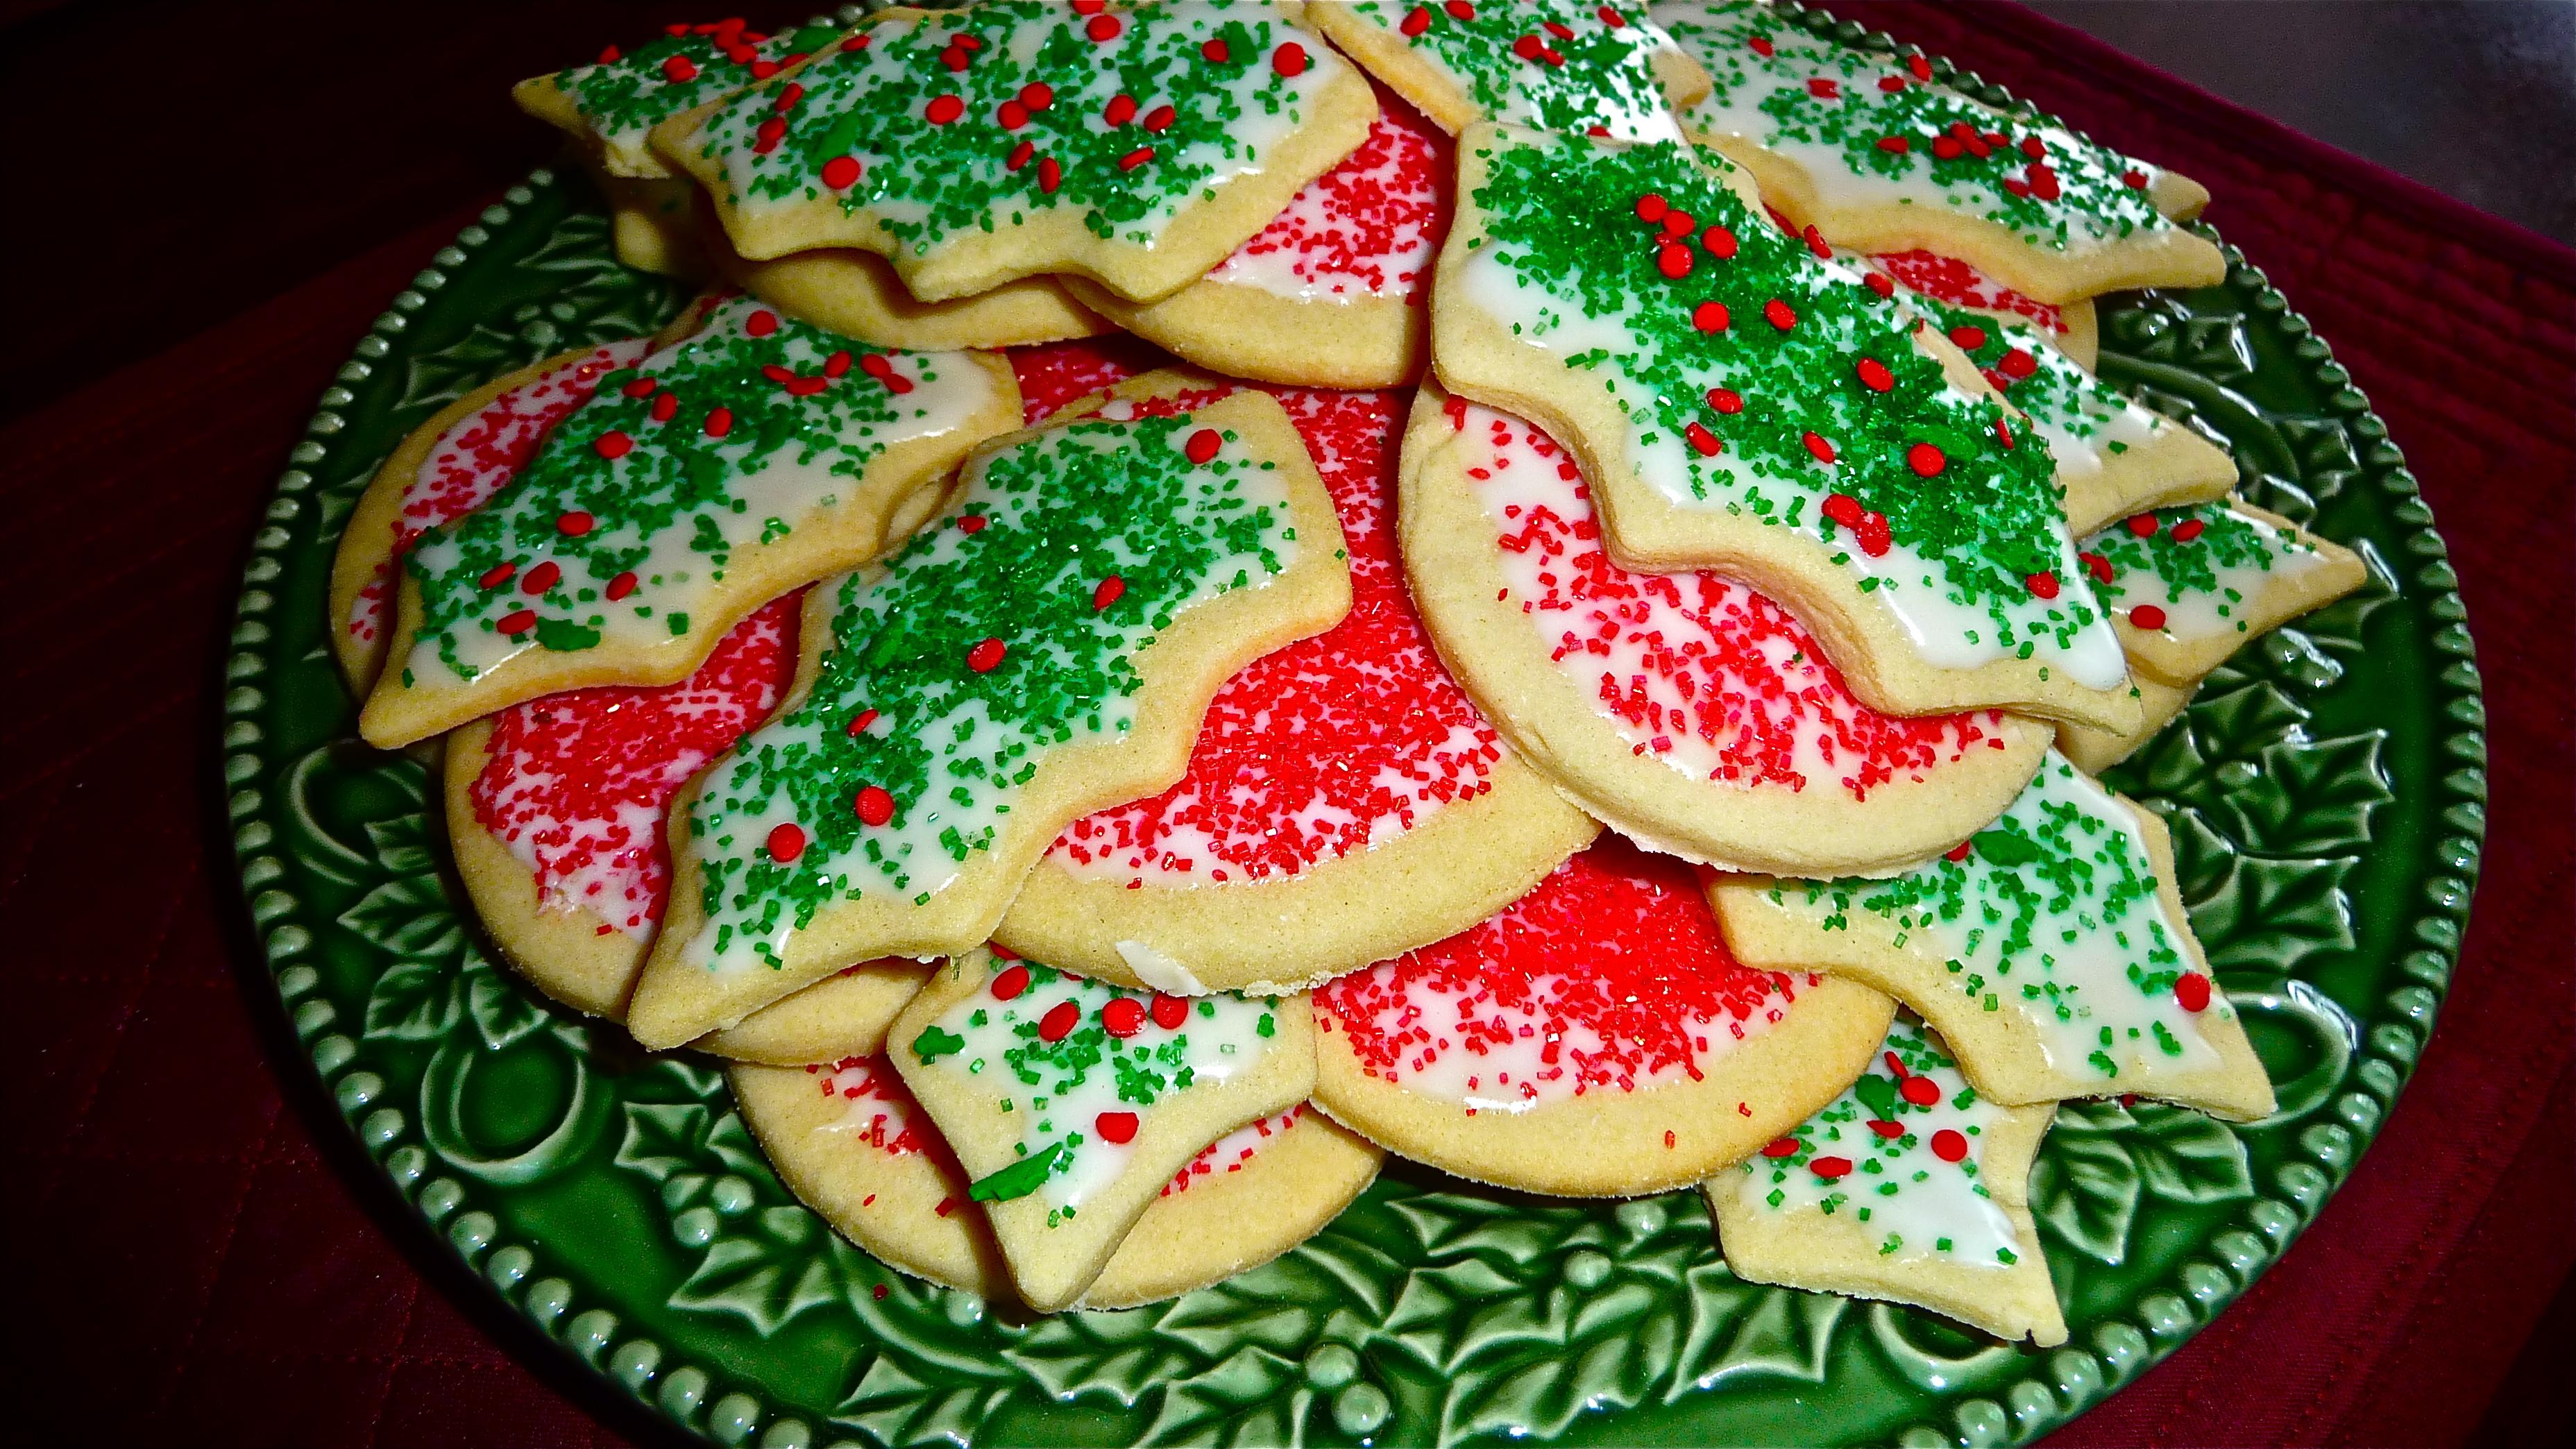 Sugar cookie recipe for christmas